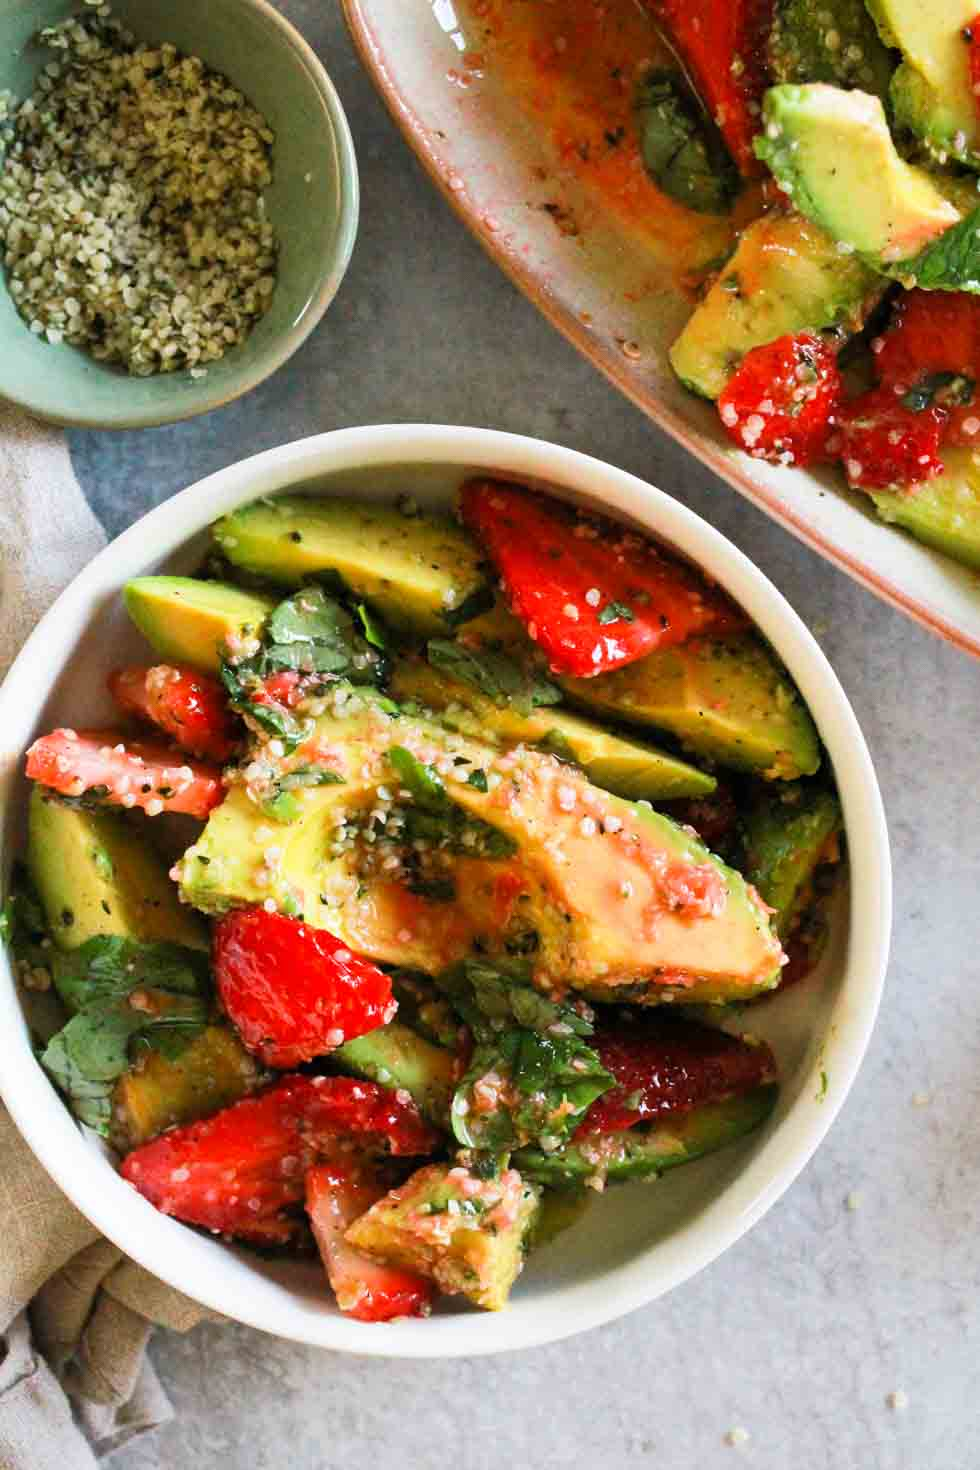 Strawberry Hemp Avocado Salad in a white bowl.